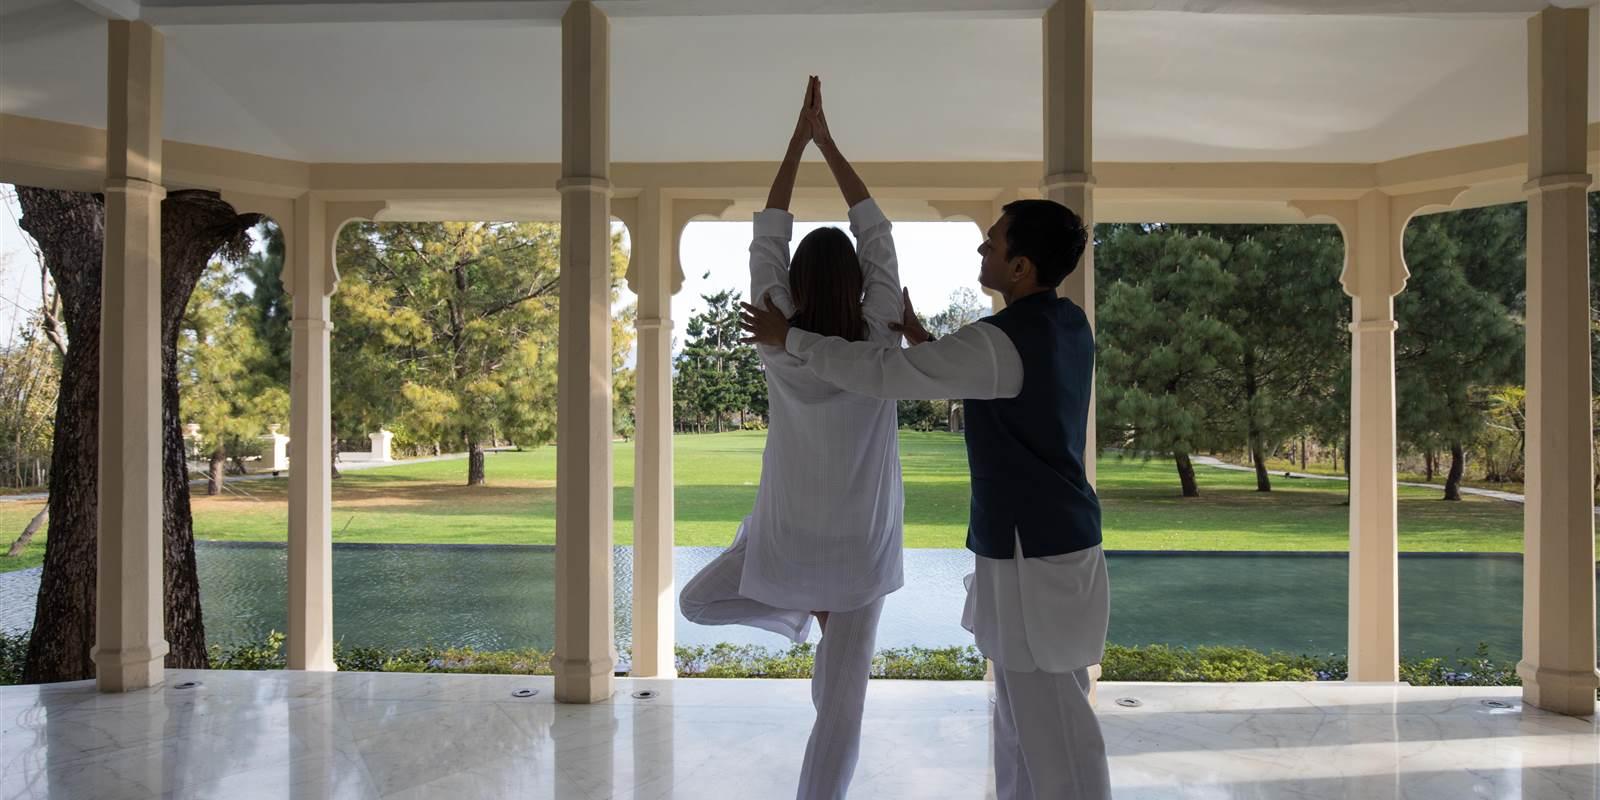 Shuddhi Kriyas. Yoga and Meditation in Ananda Spa in The Himalayas